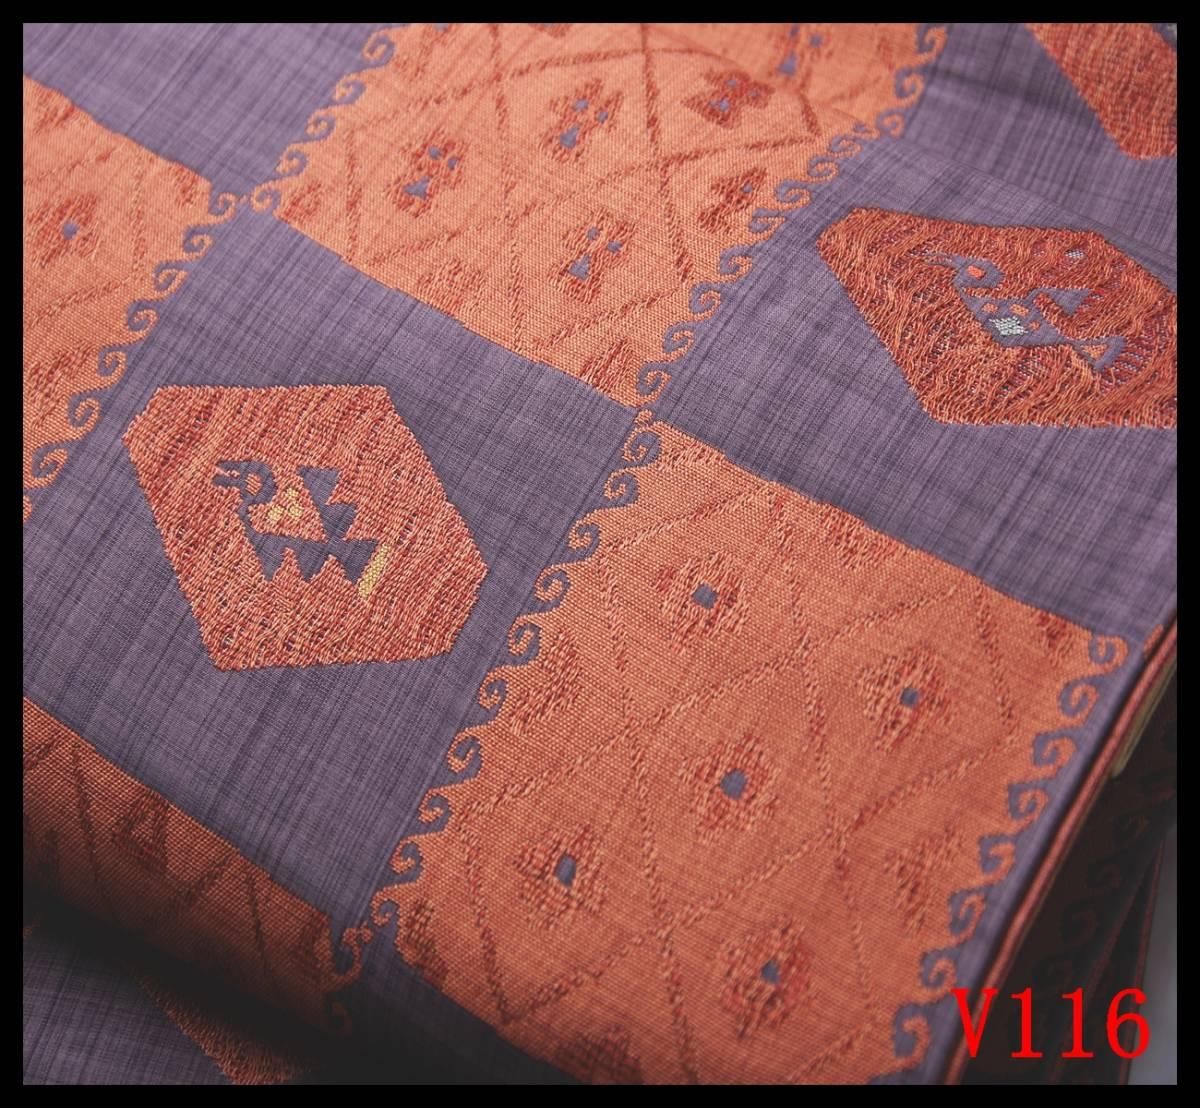 【V116】厳選西陣逸品 よろけ織 市松に古典文様 紅桔梗肉桂色 六通高級美術袋帯 正絹 検★袋帯簪帯締め_画像3